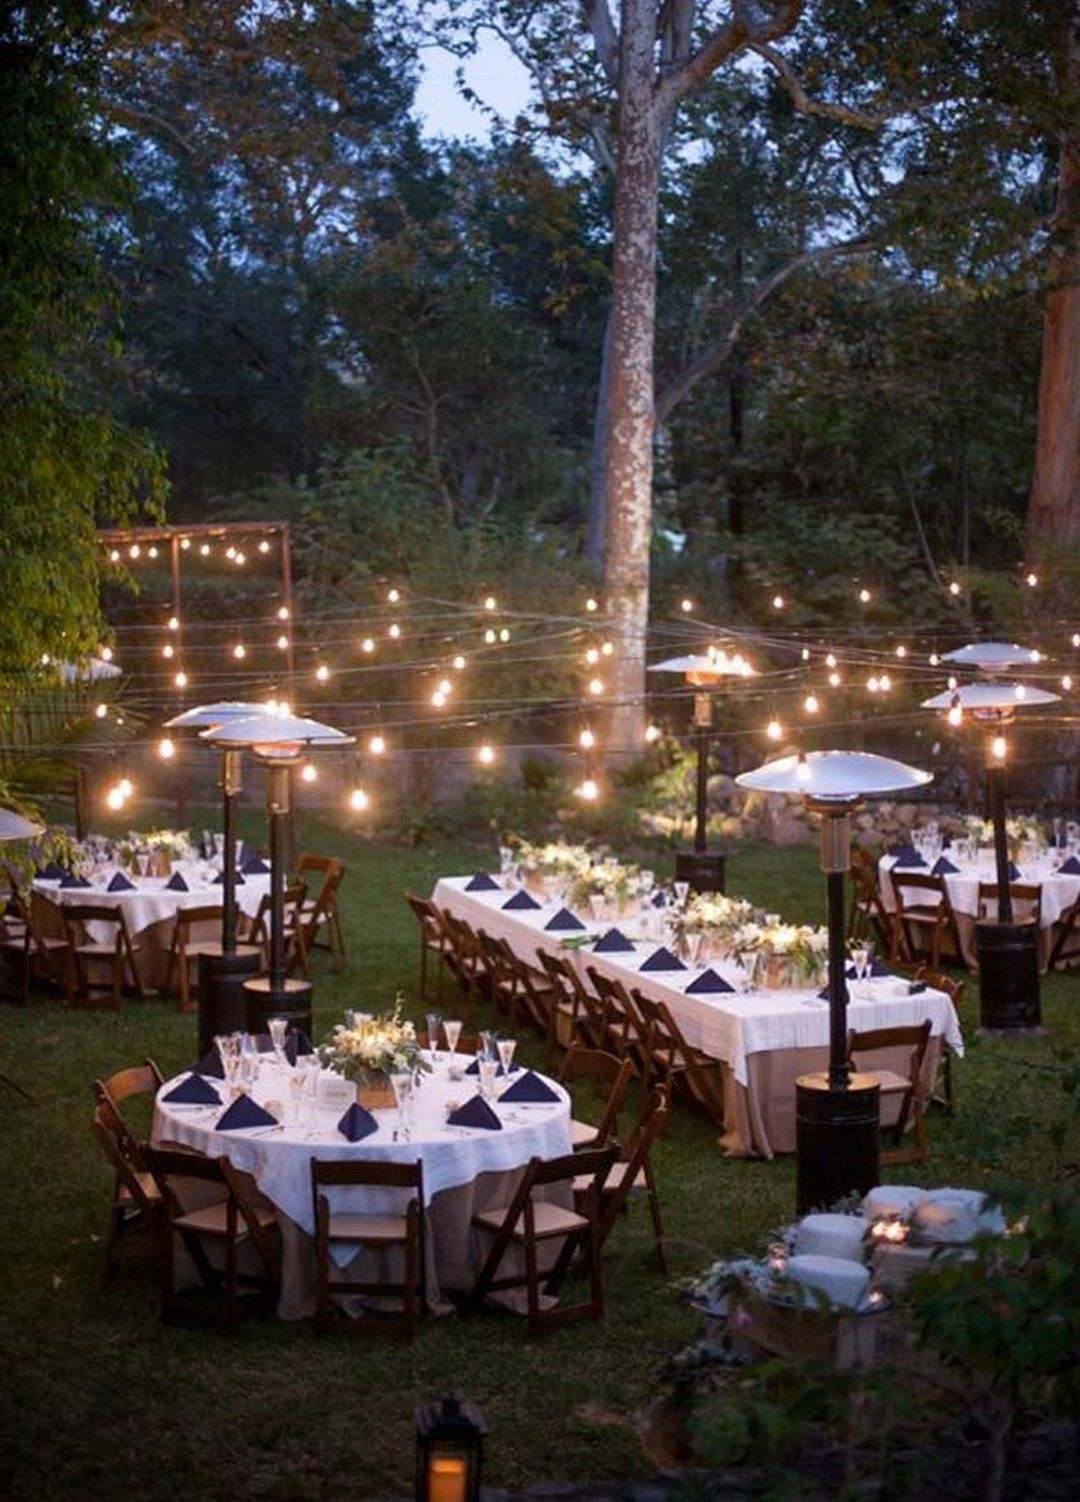 1 Sweet And Romantic Backyard Wedding Decor Ideas Romantic Backyard Outdoor Wedding Backyard Dinner Party Backyard garden wedding reception